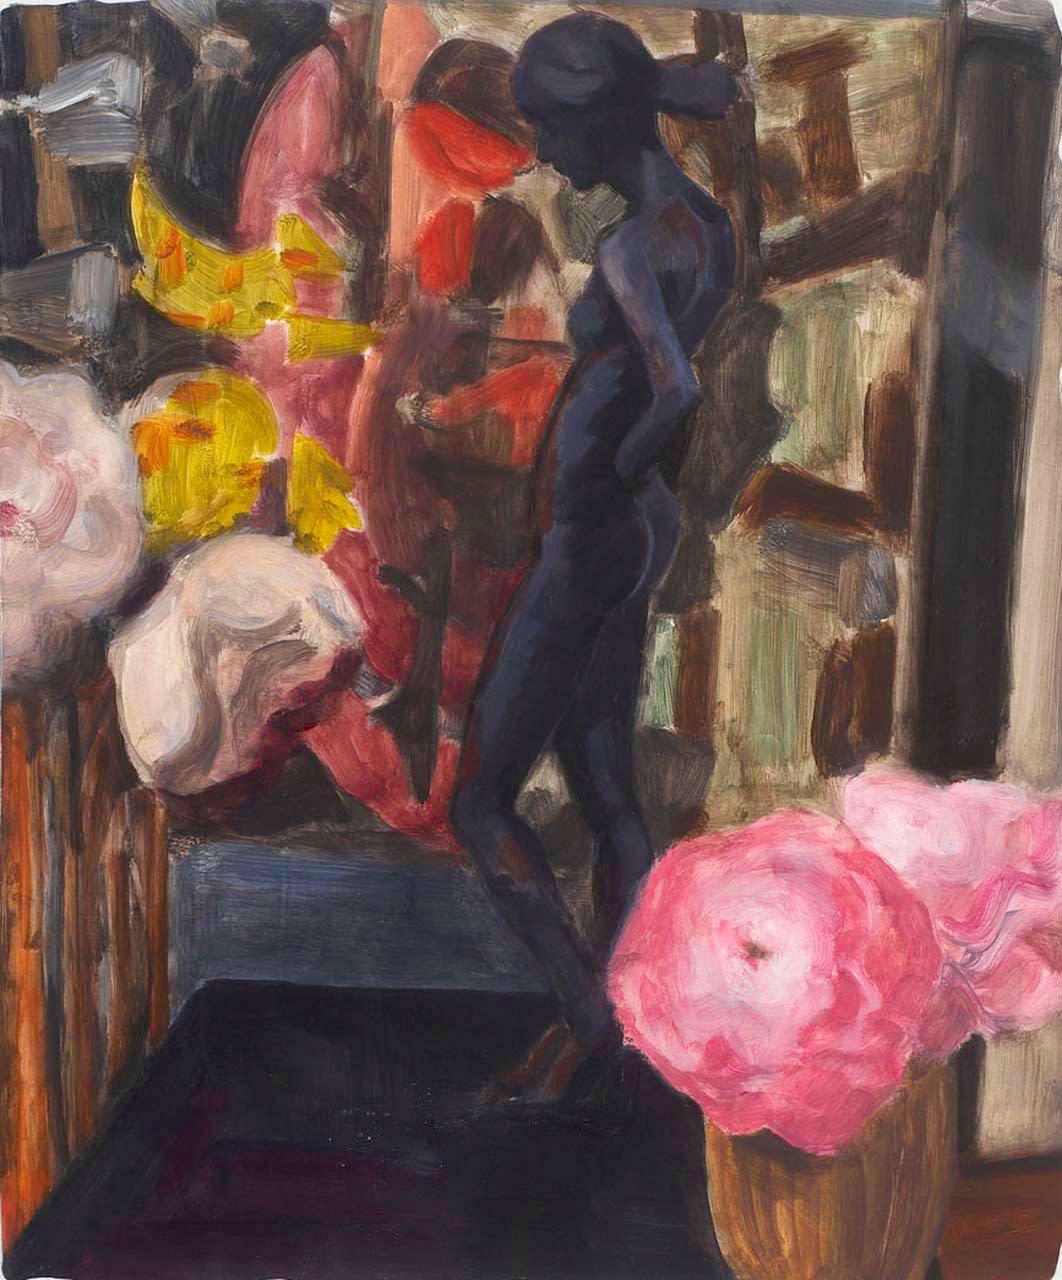 "<div class=""artwork_caption""><p>Yoko Still Life (After Don Brown), 2009</p></div>"